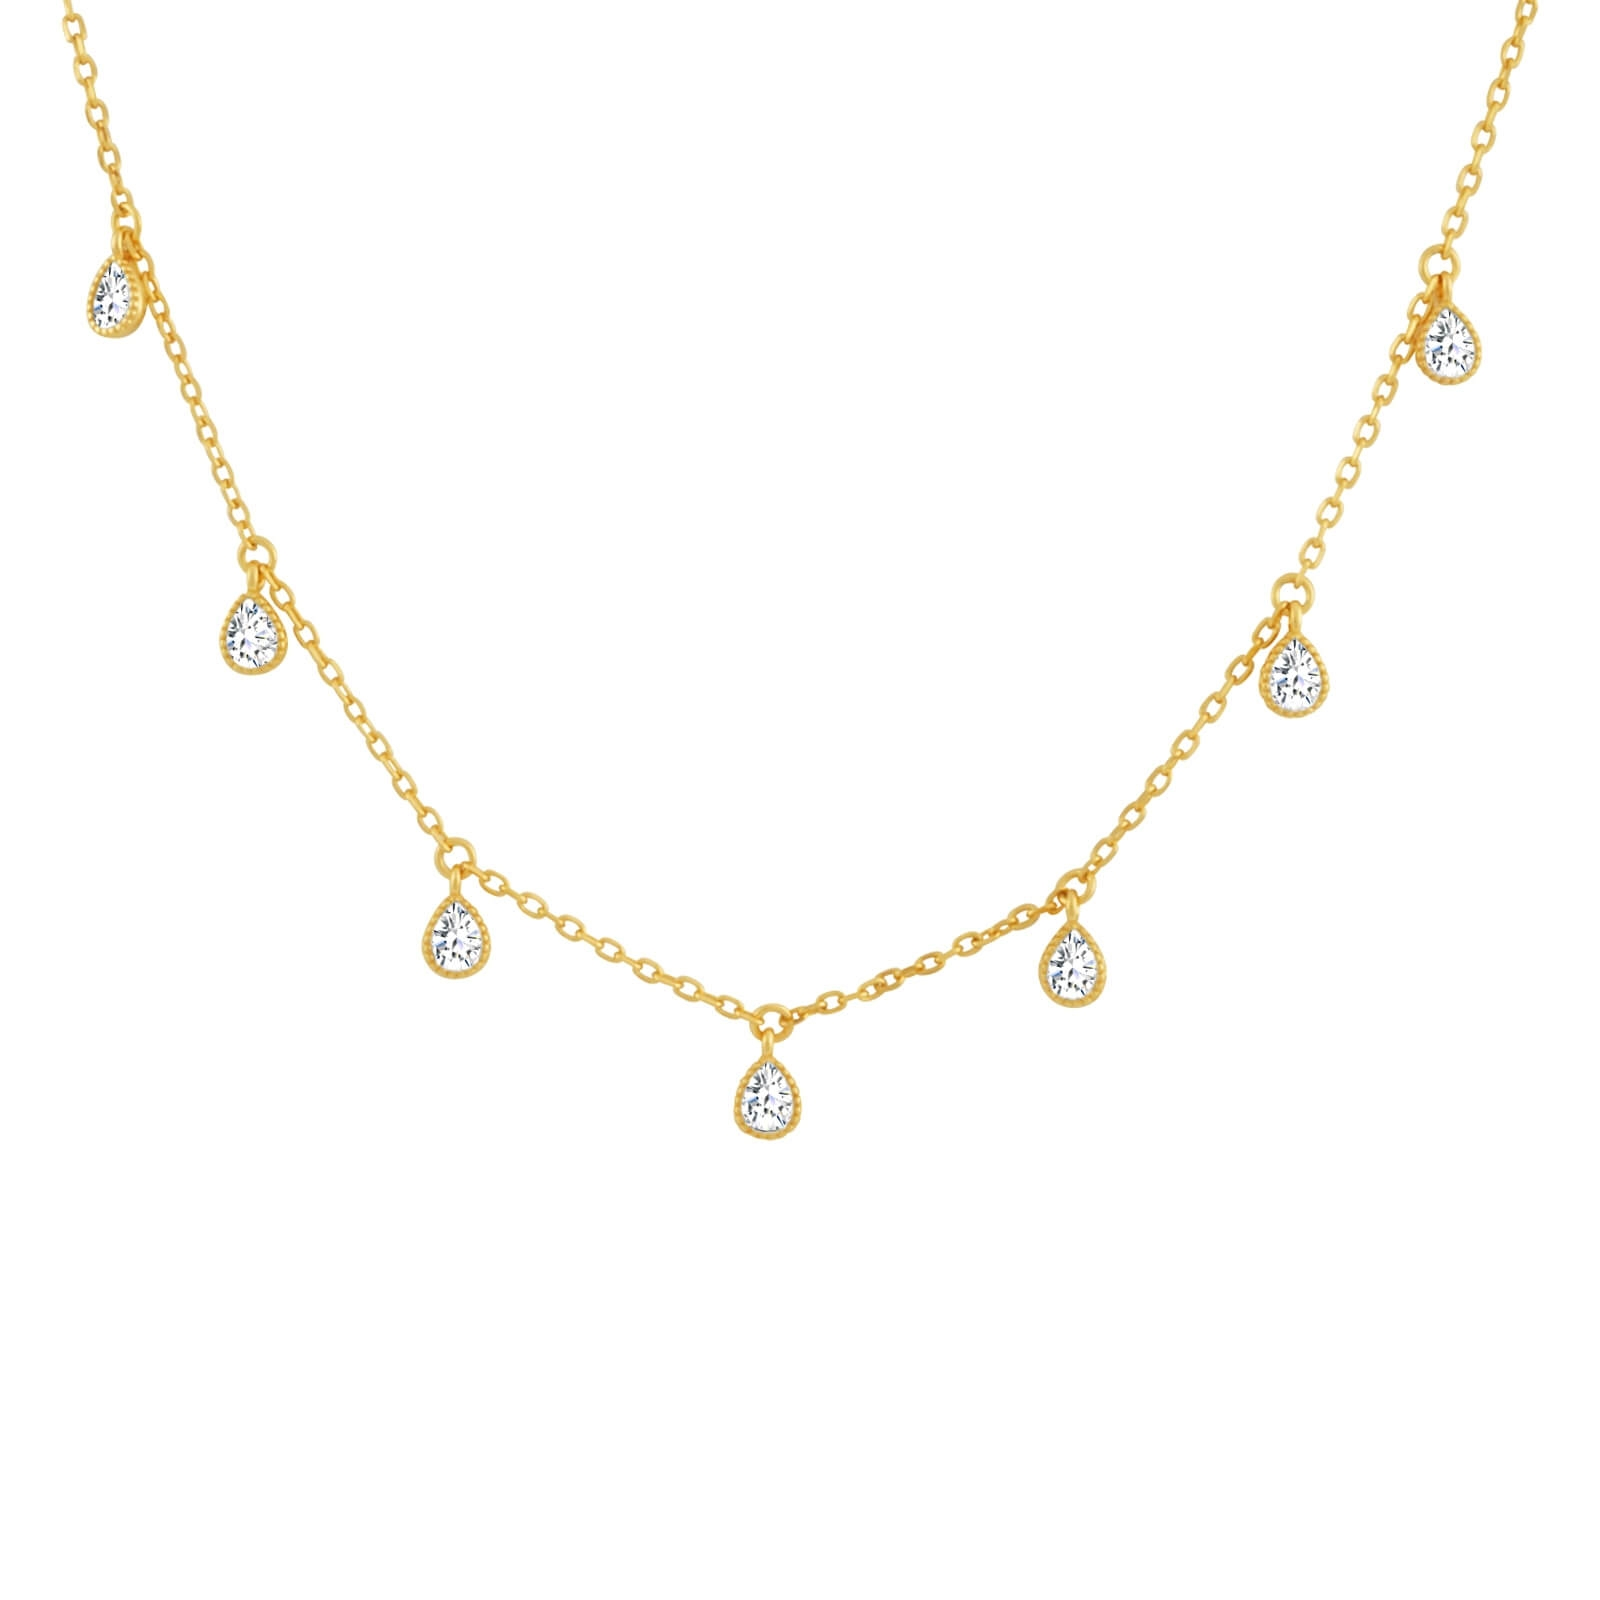 Teardrop crystal choker necklace 18k gold vermeil sterling silver teardrop station choker necklace gold aloadofball Image collections